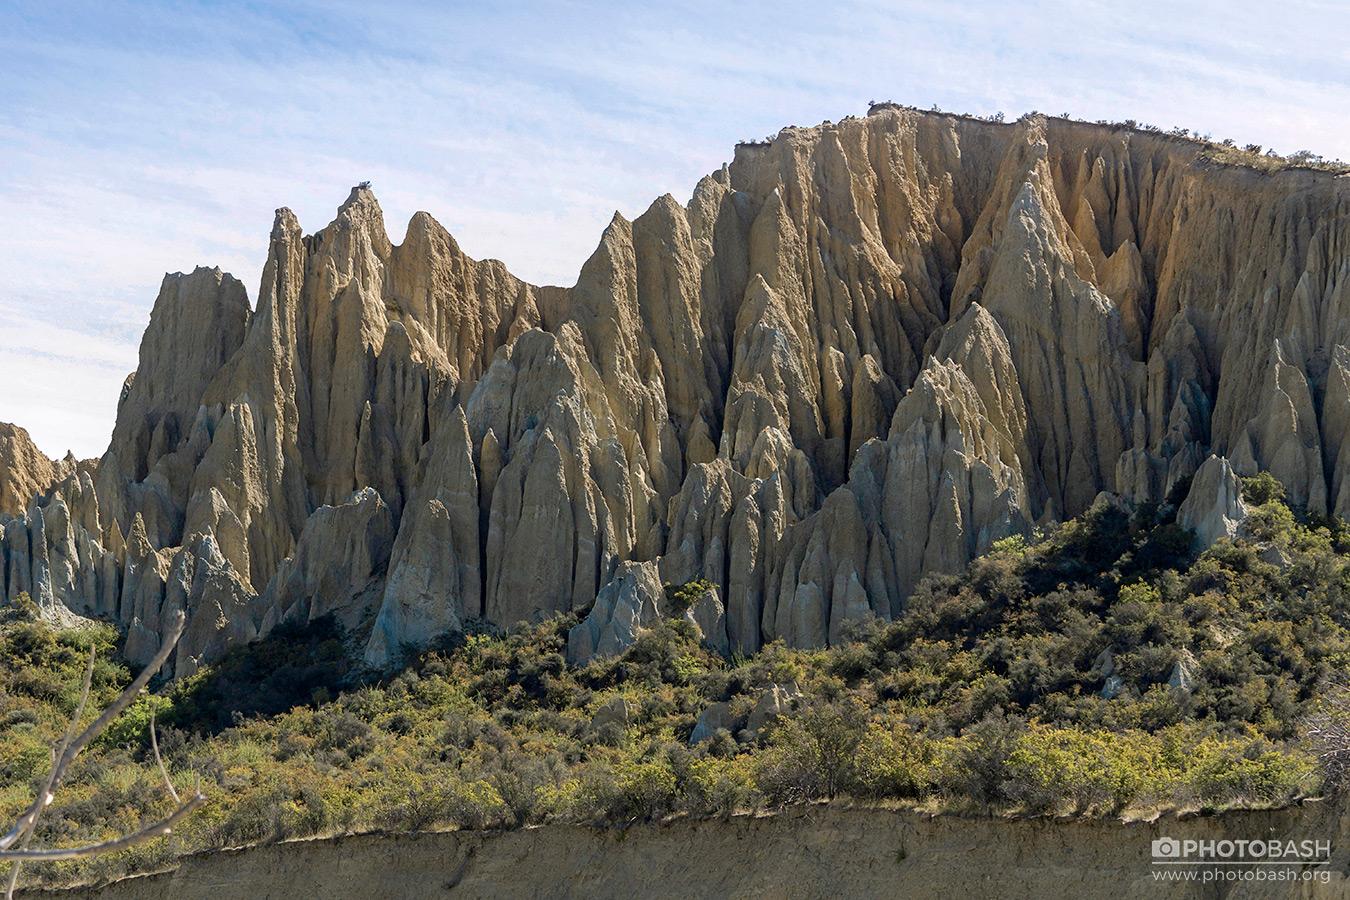 Clay-Cliffs-Wasteland-Rock-Formations.jpg